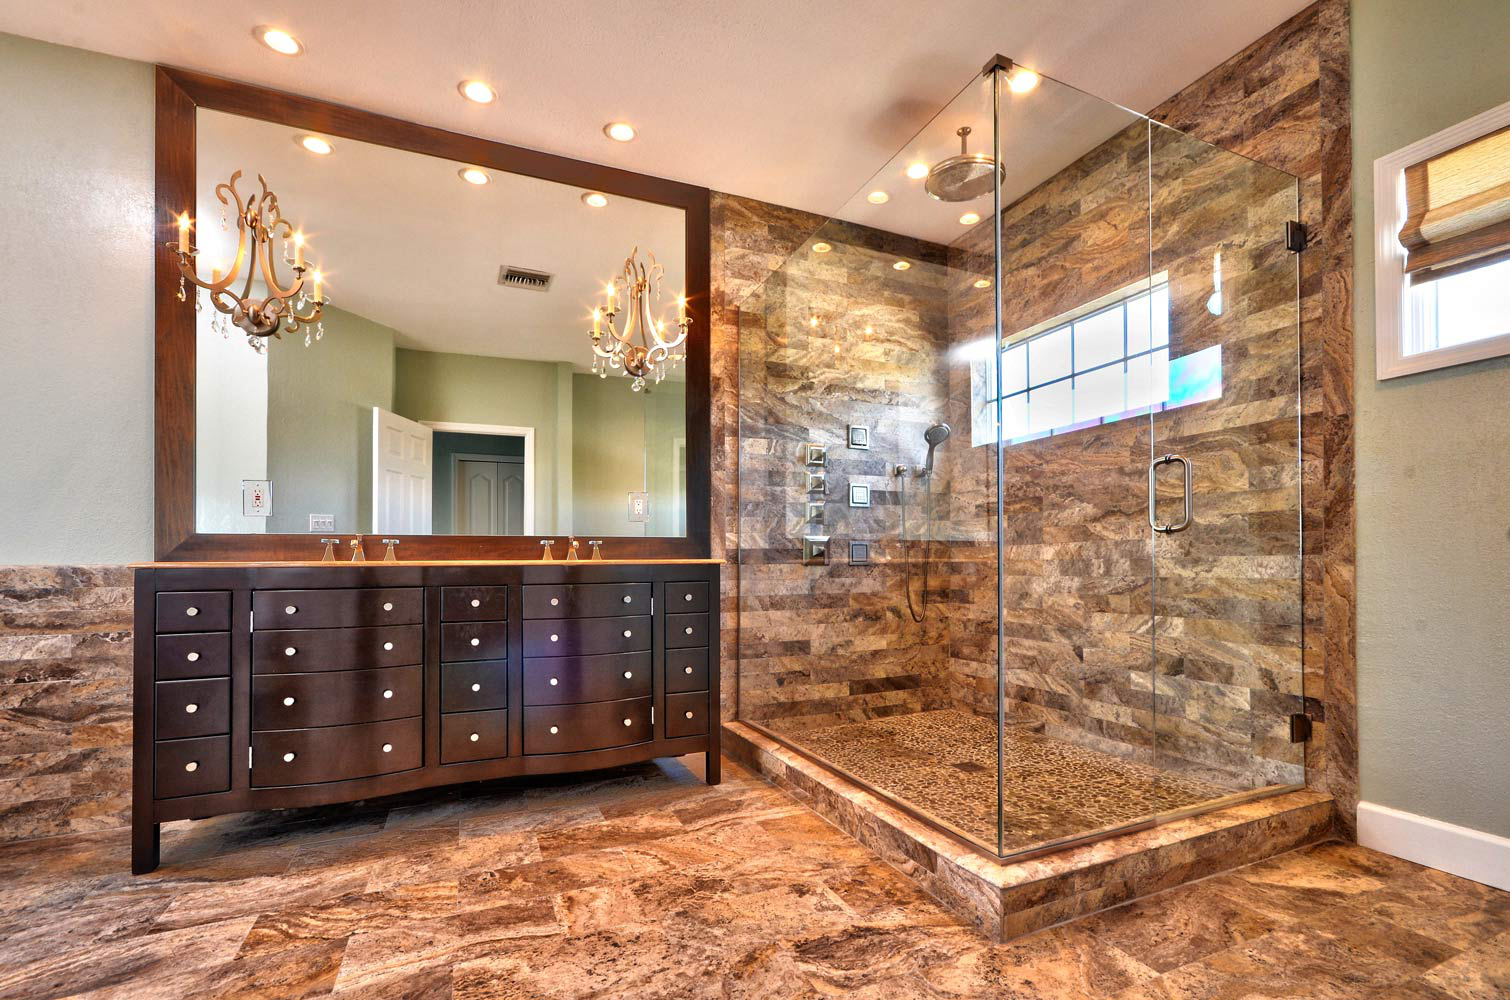 Gulfport custom cabinet shower detail by Crespo Design Group